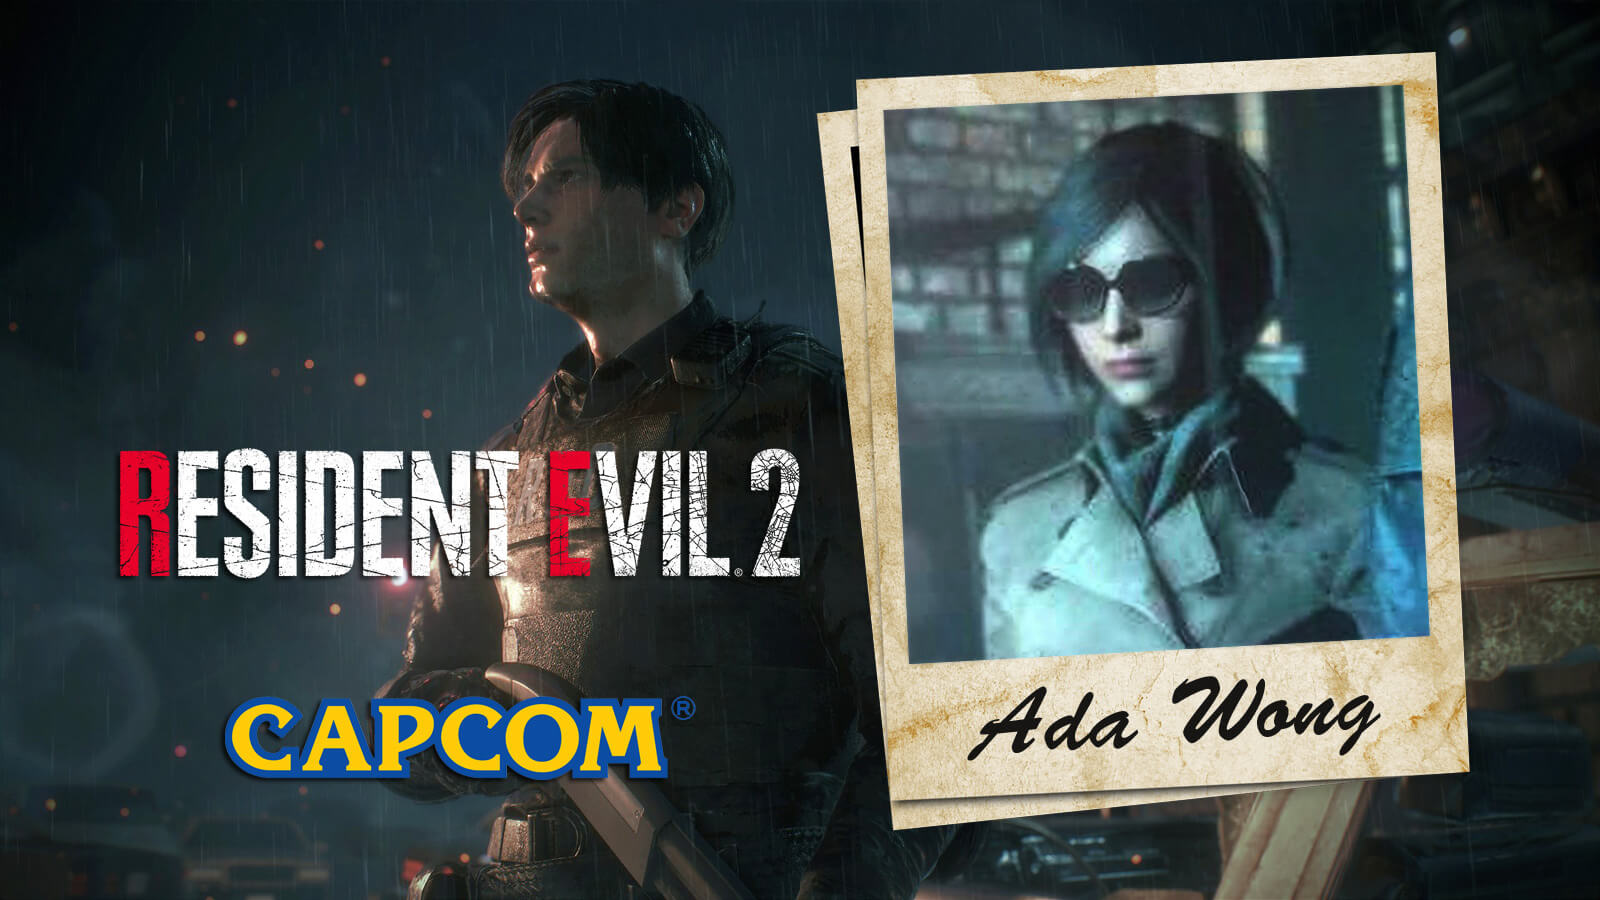 06dadca2cc3 Resident Evil 2 Remake Ada Wong First Look - Gameslaught